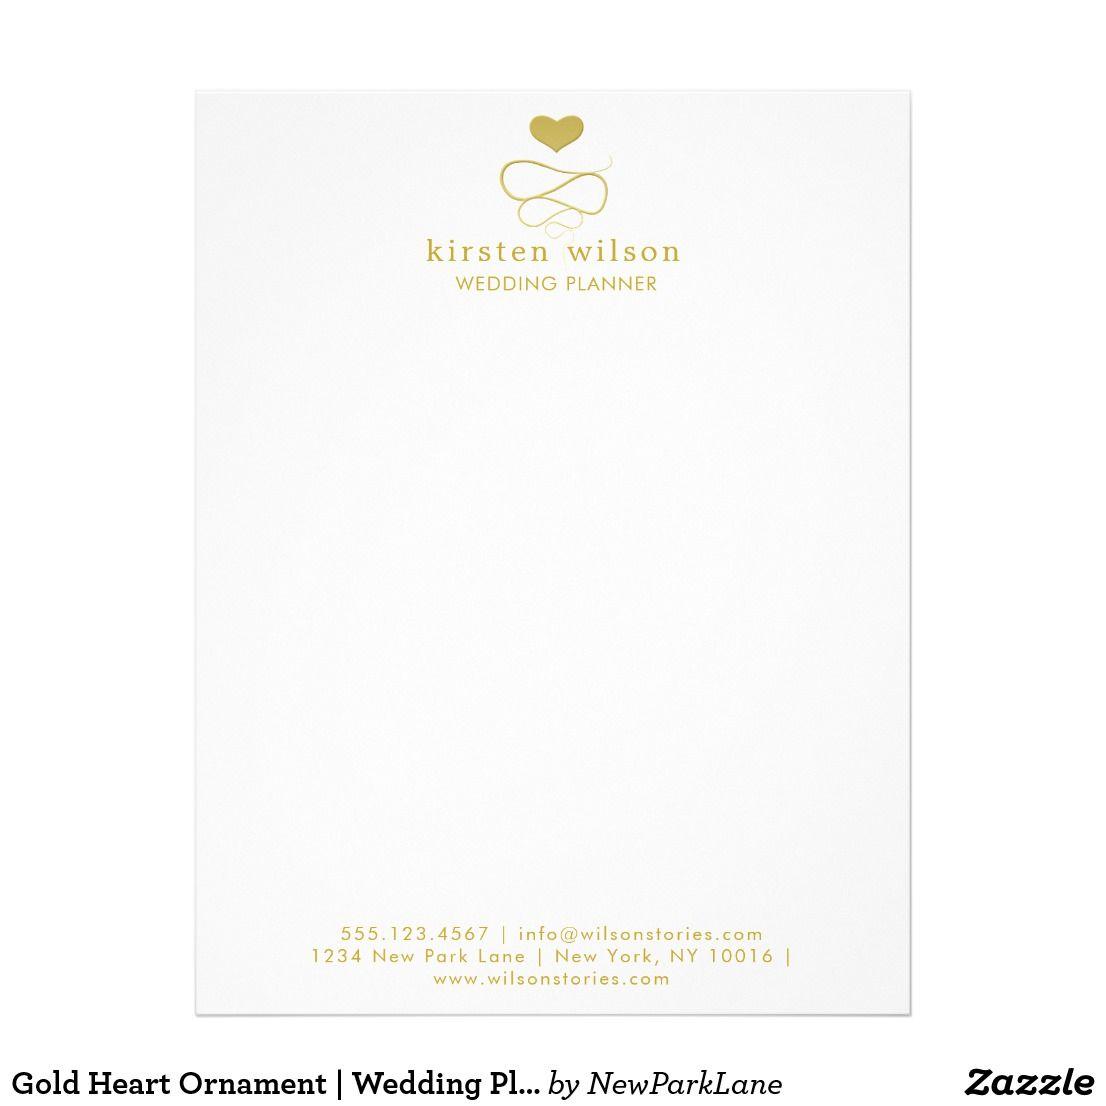 Gold Heart Ornament Wedding Planner Letterhead Of